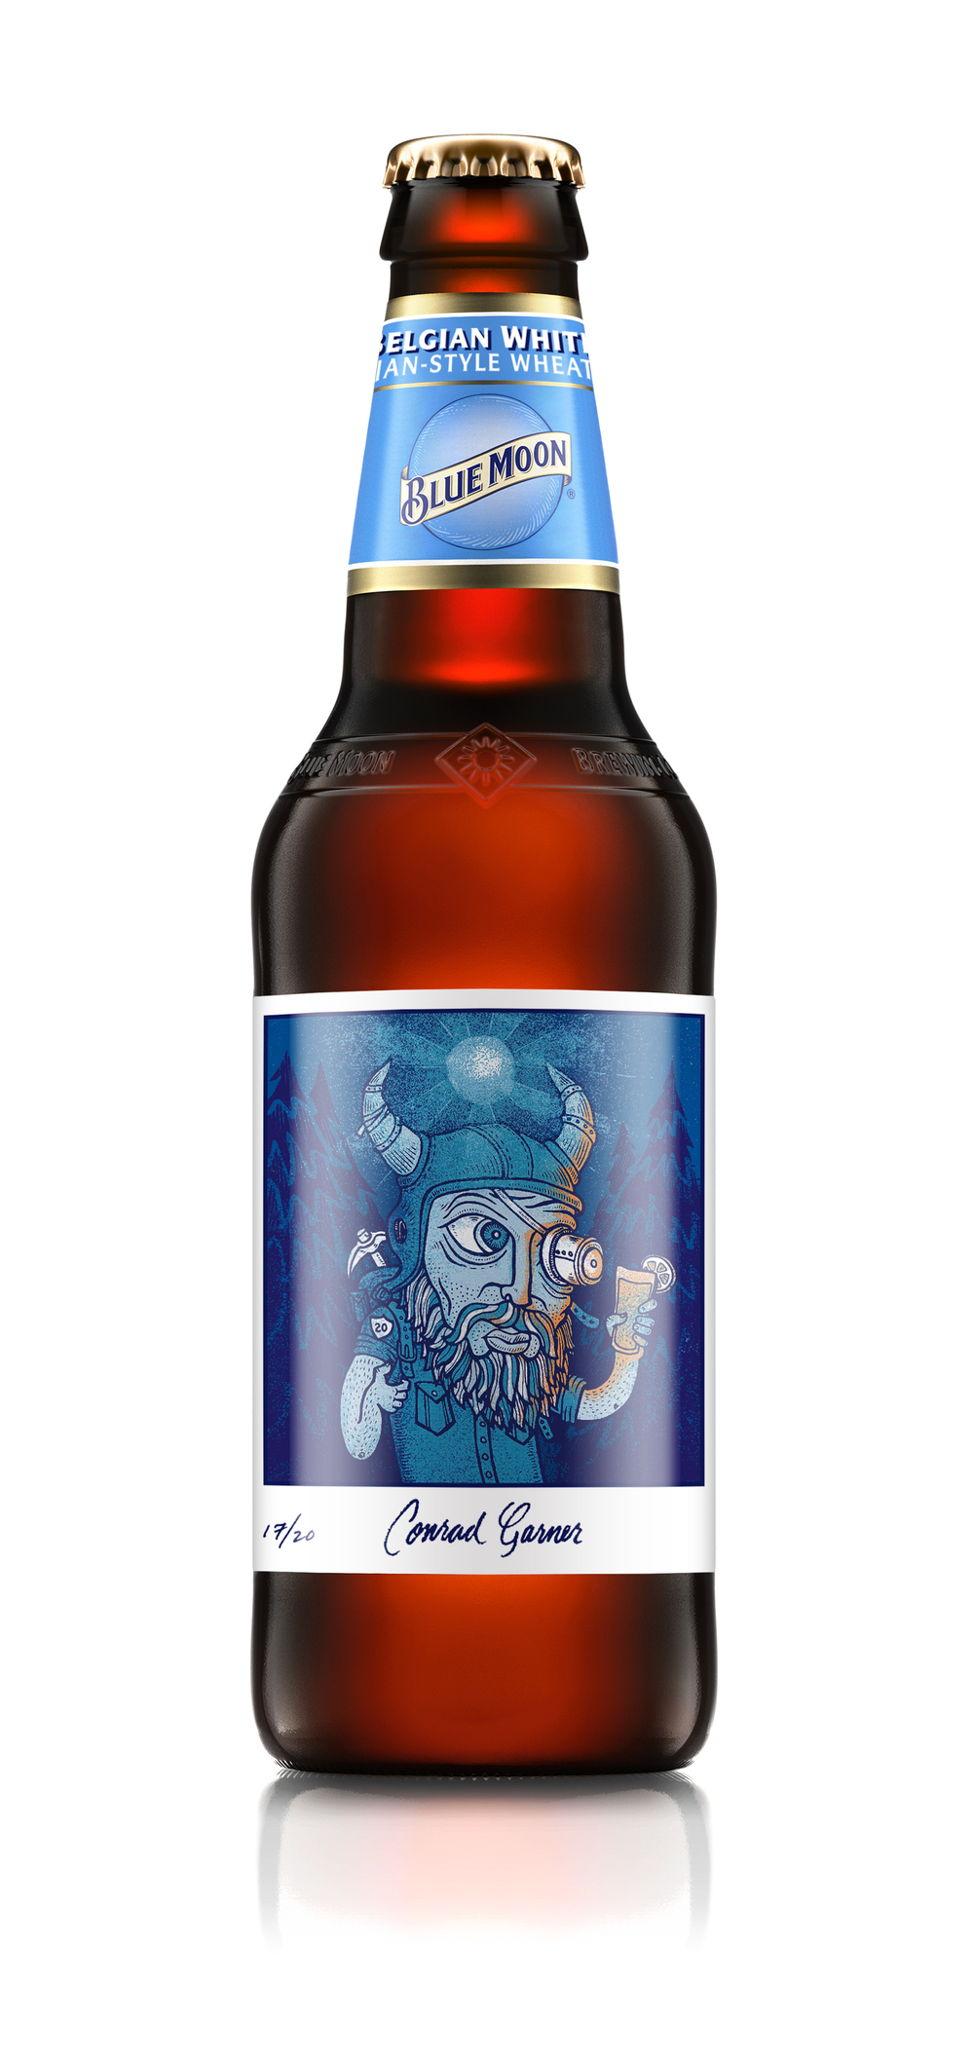 BMO-195A_Bottle_12z_Render_ConradGarner_150401_FJ.jpg